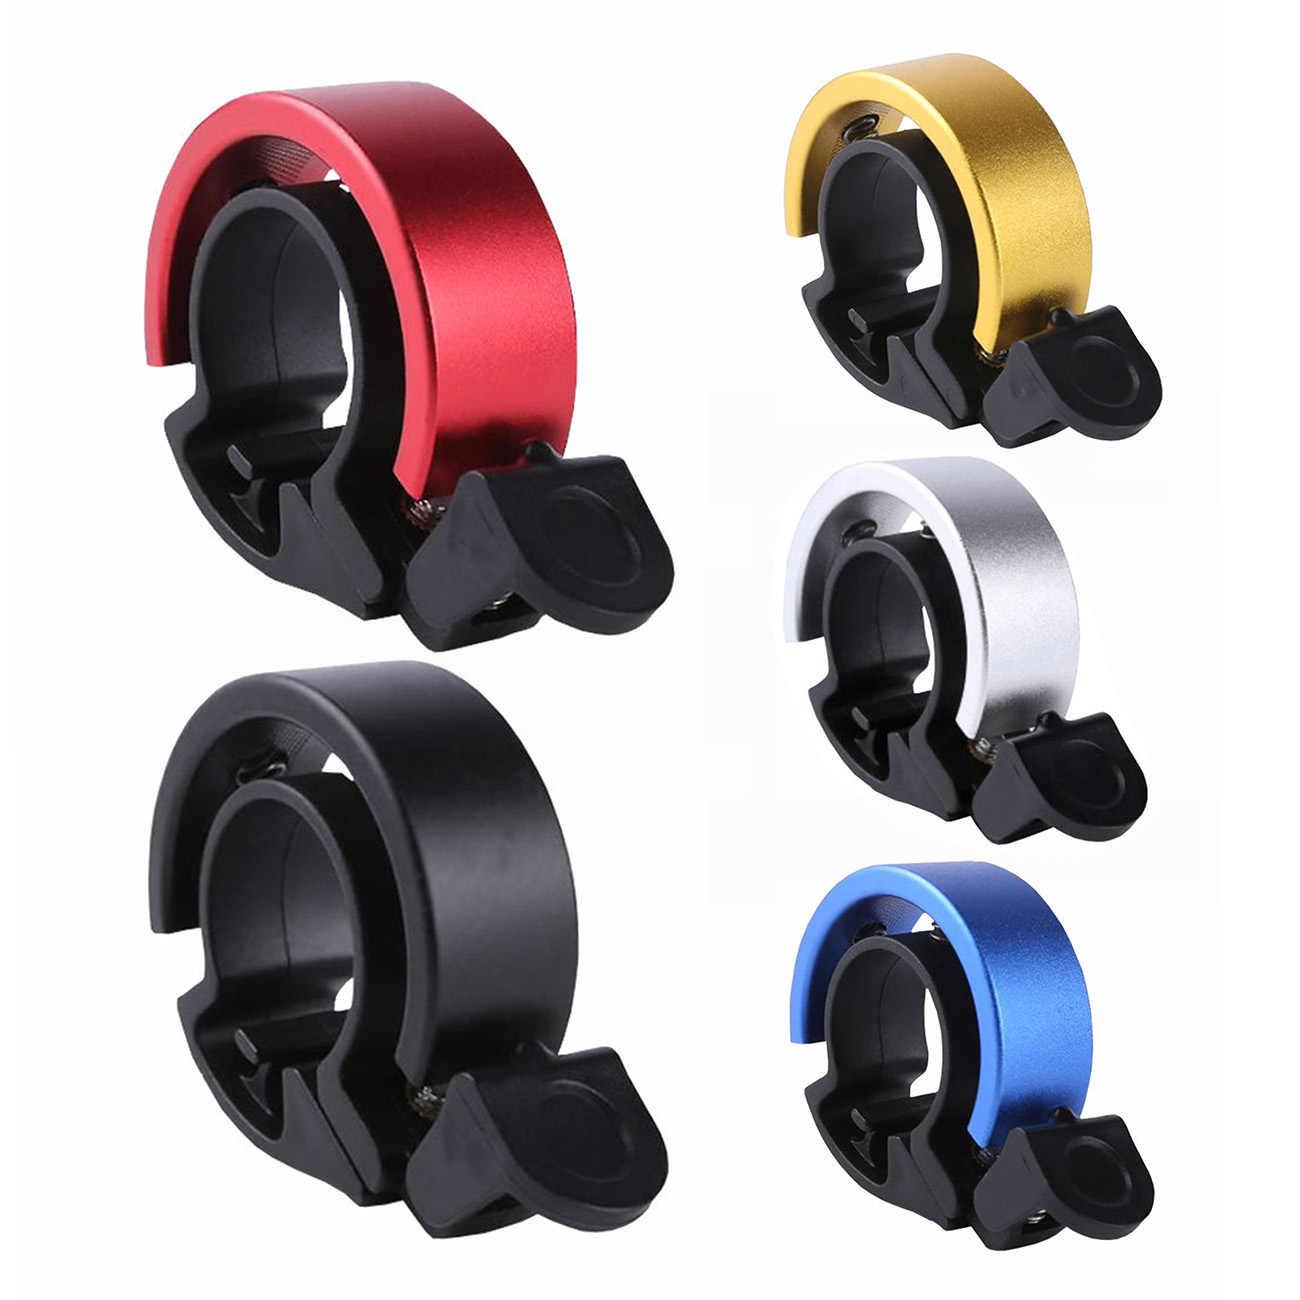 Bike Bicycle Cycling Aluminium Bell Ring Alarm 90db Loud Safety Handlebar Horn